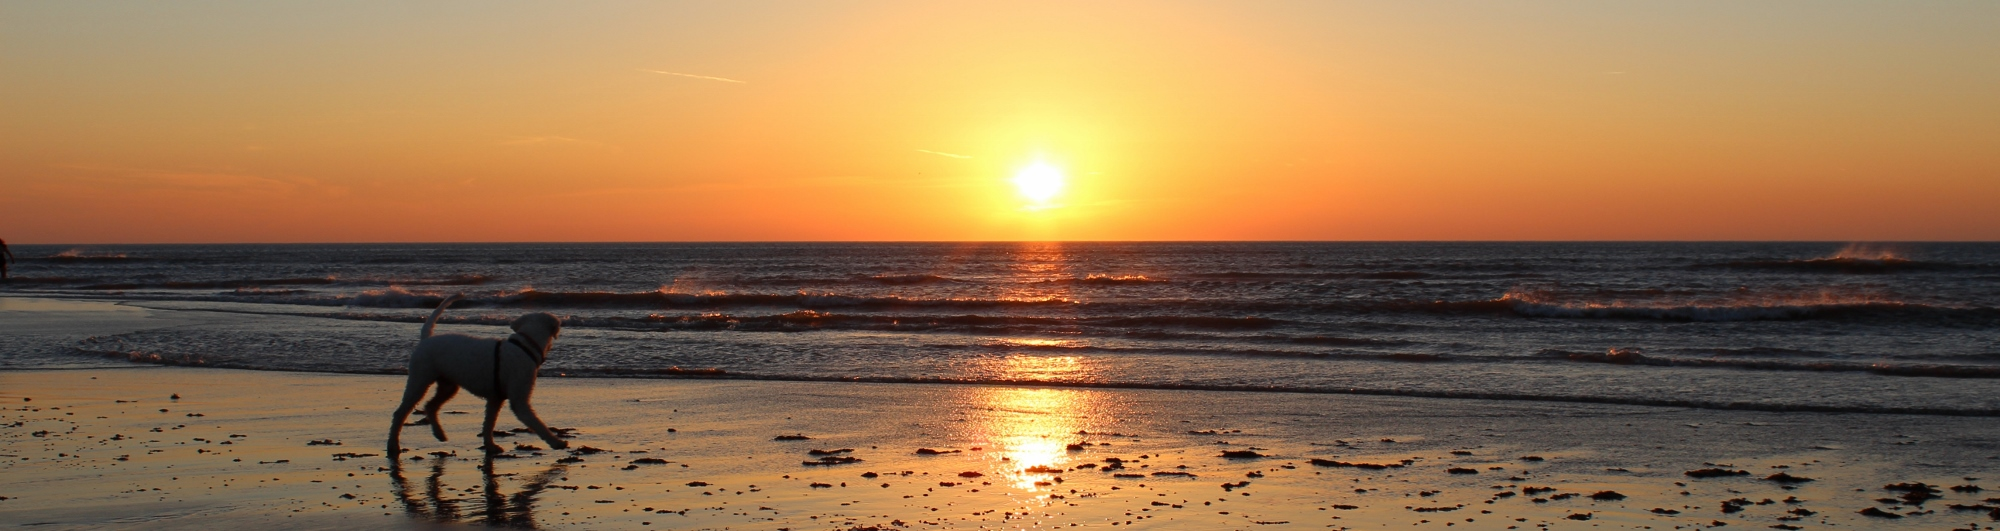 sunset at Dinas Dinlle